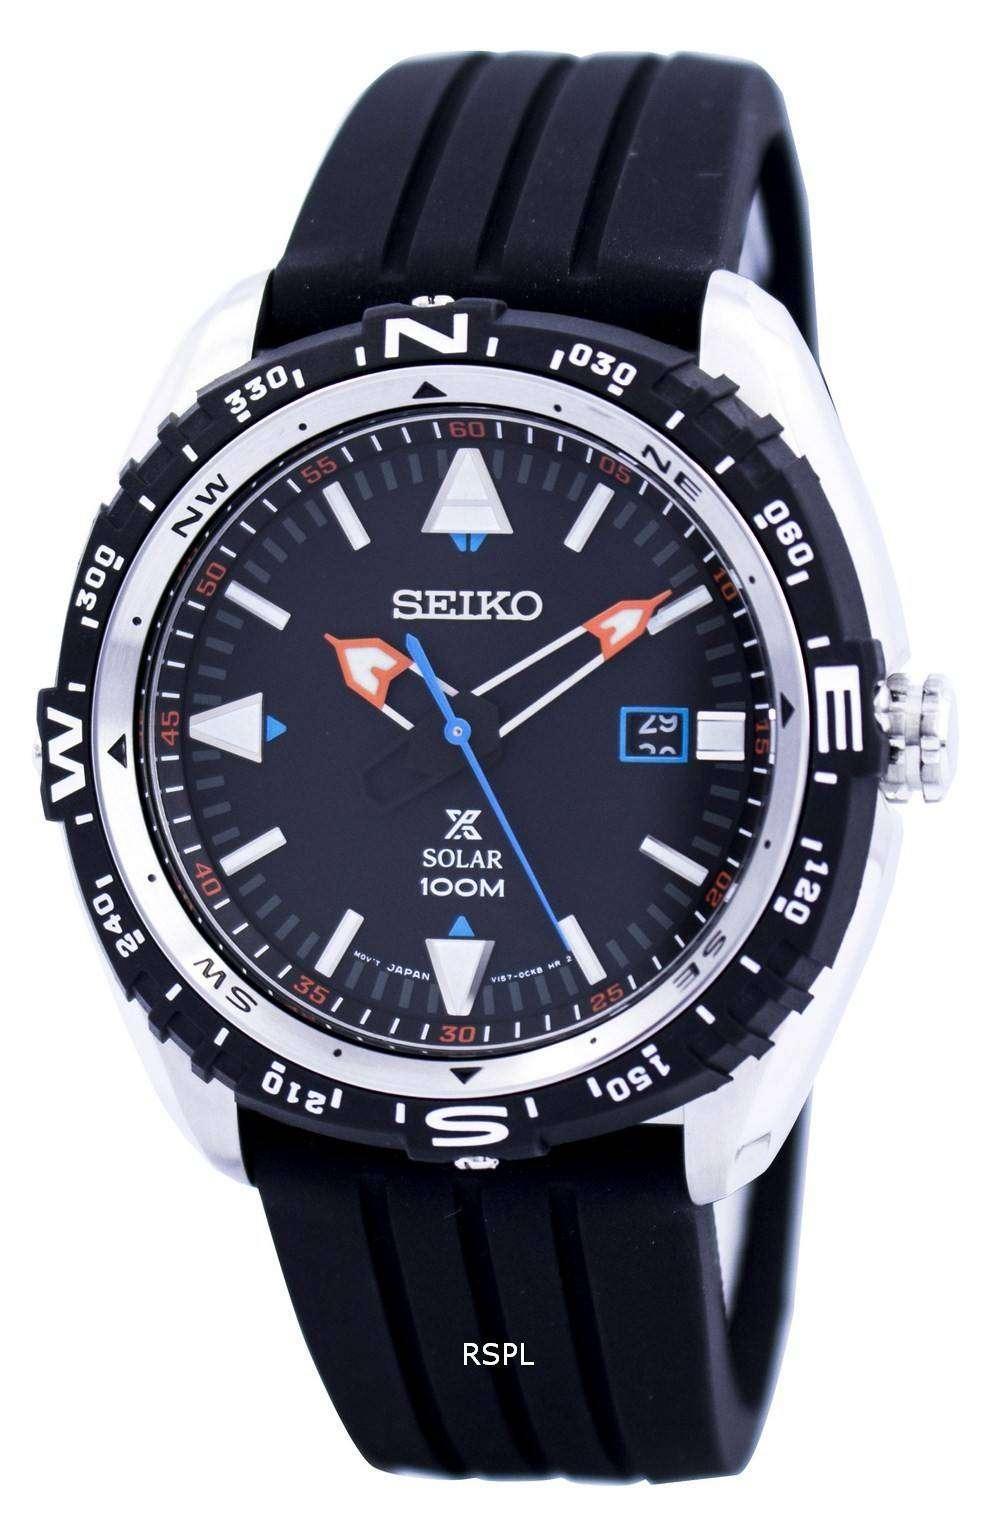 Sne Stock Price >> Seiko Prospex Land Solar Powered 100M SNE423 SNE423P1 SNE423P Men's Watch - DownUnderWatches